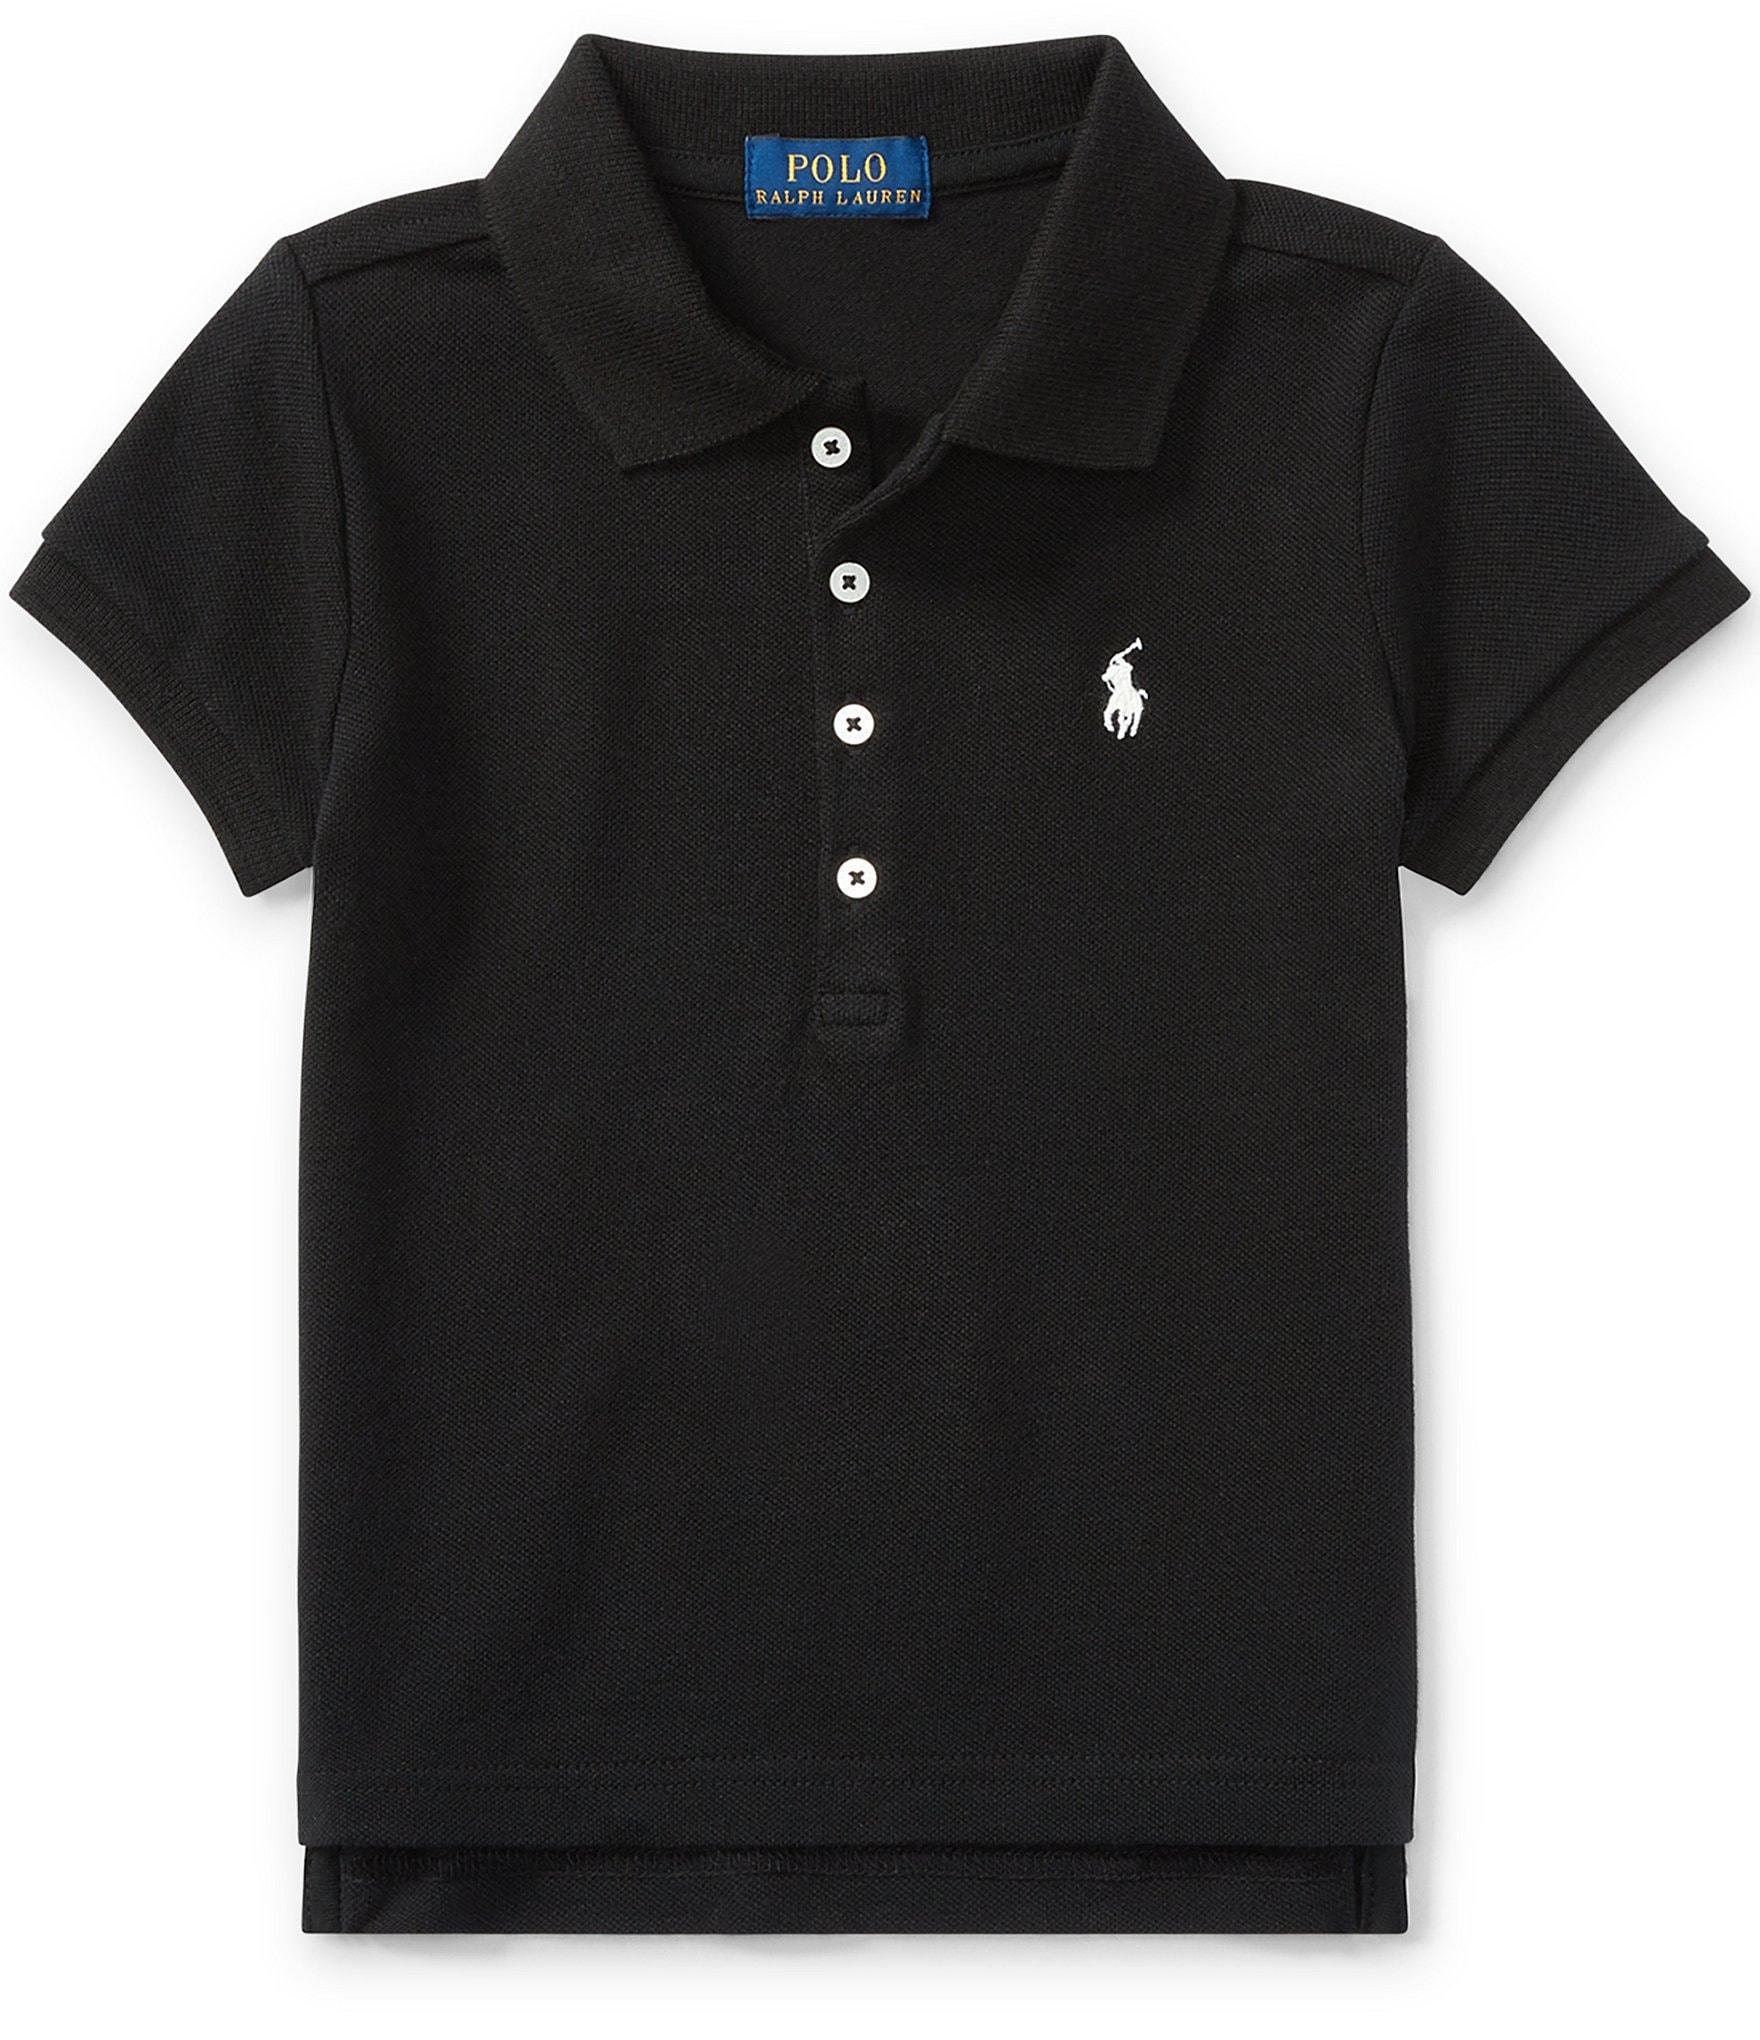 monogrammed polo shirts ralph lauren handbags the bay